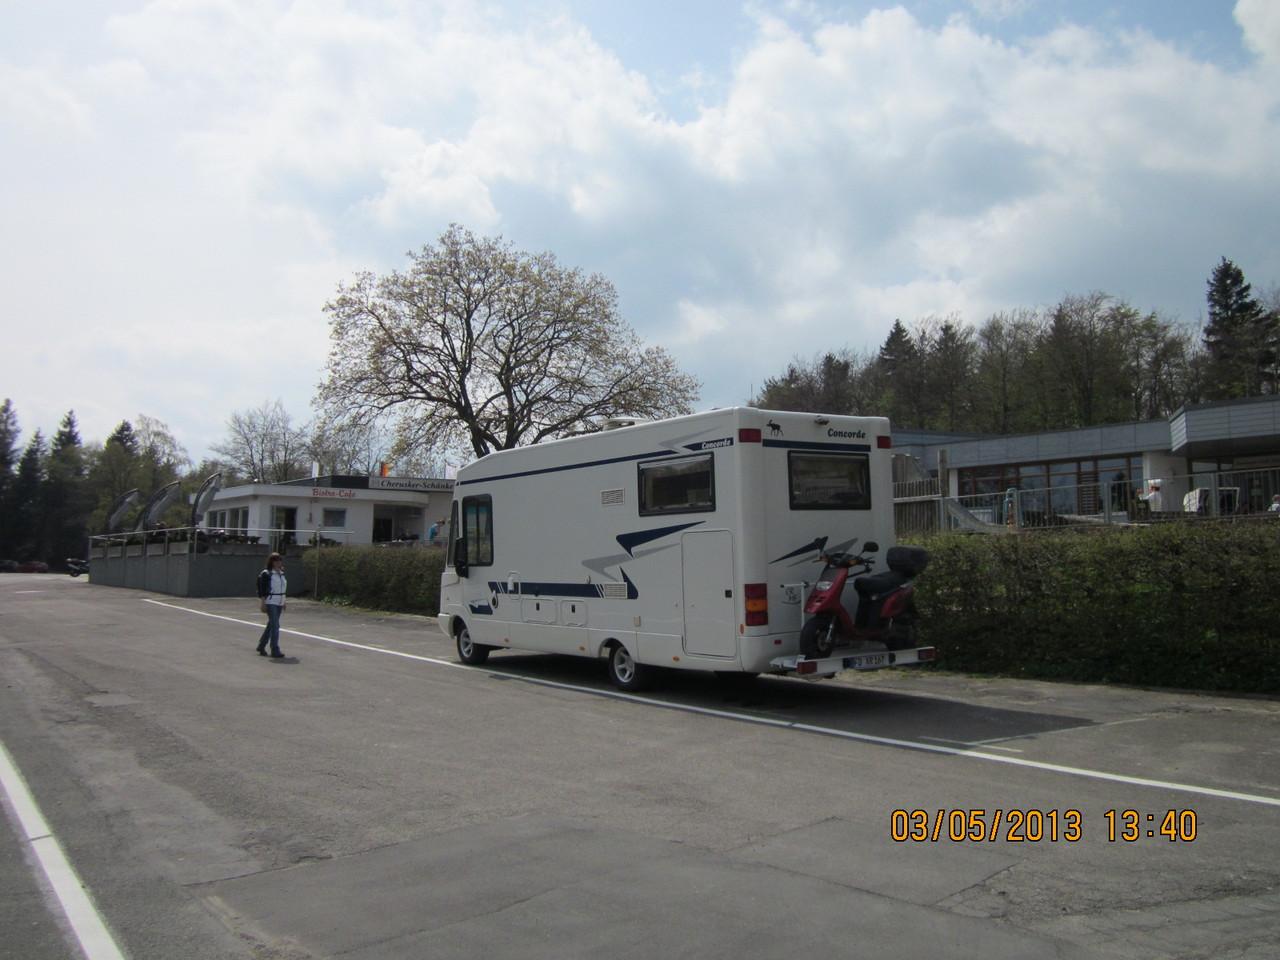 Parkplatz am Hermannsdenkmal